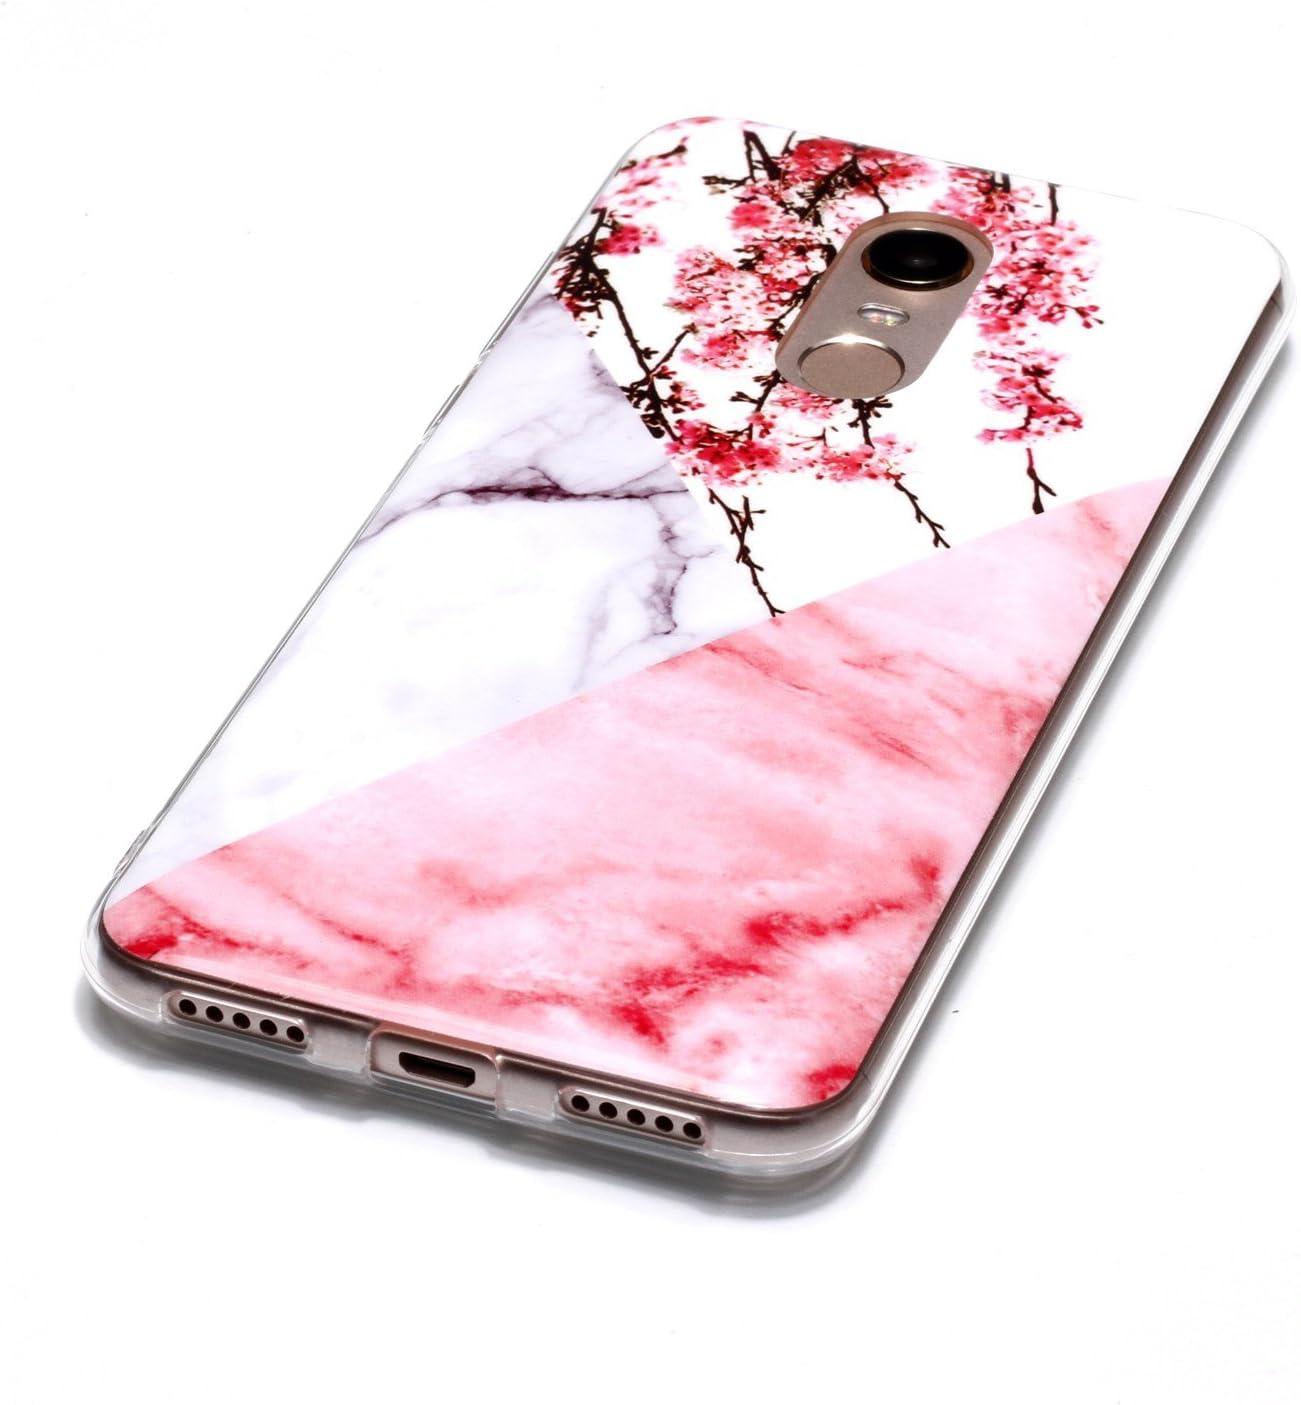 Redmi 5 Plus Redmi 5 Plus Cover M/ármol Rosa Case Funda TPU Gel Cubierta Suave Silicona Carcasa Case Cover Tapa Caso para Xiaomi Redmi Note 5 5.99 ZXLZKQ Funda para Xiaomi Redmi Note 5